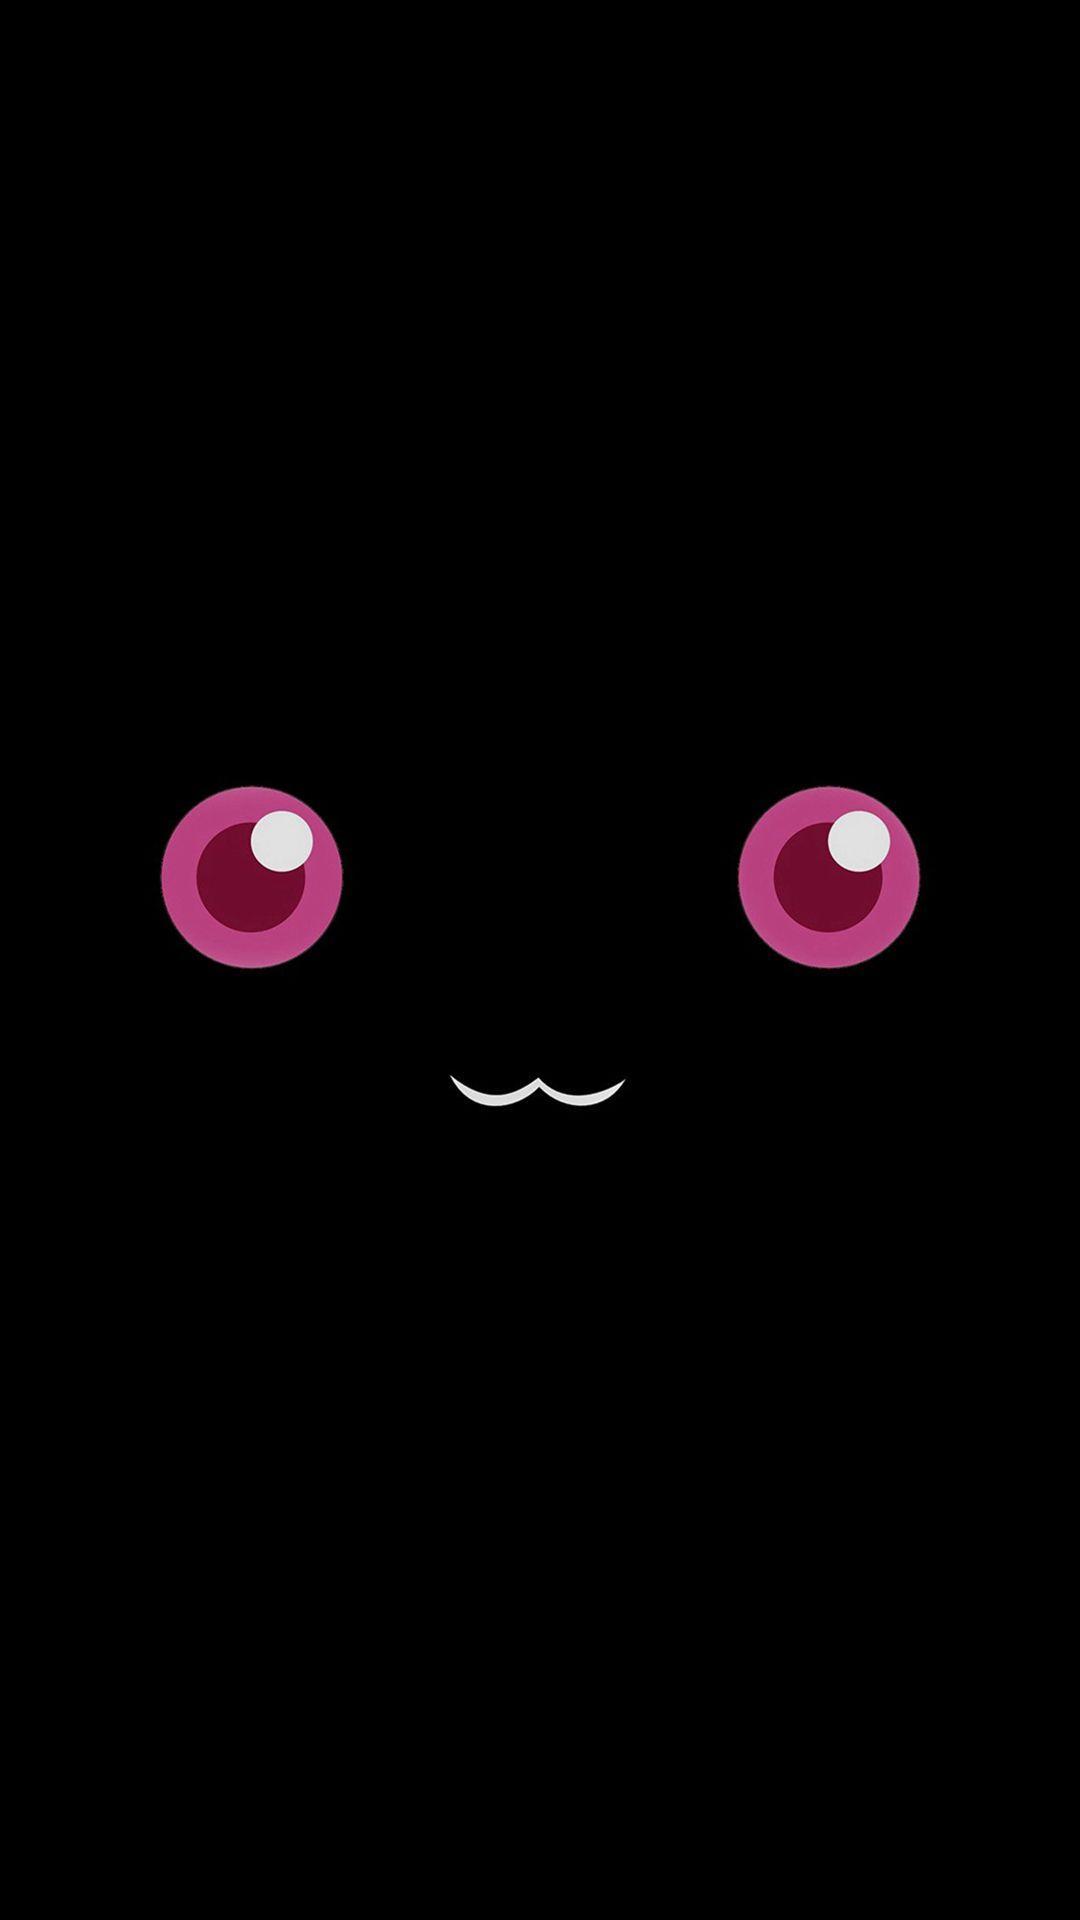 Cute Dark Anime Wallpapers Top Free Cute Dark Anime Backgrounds Wallpaperaccess